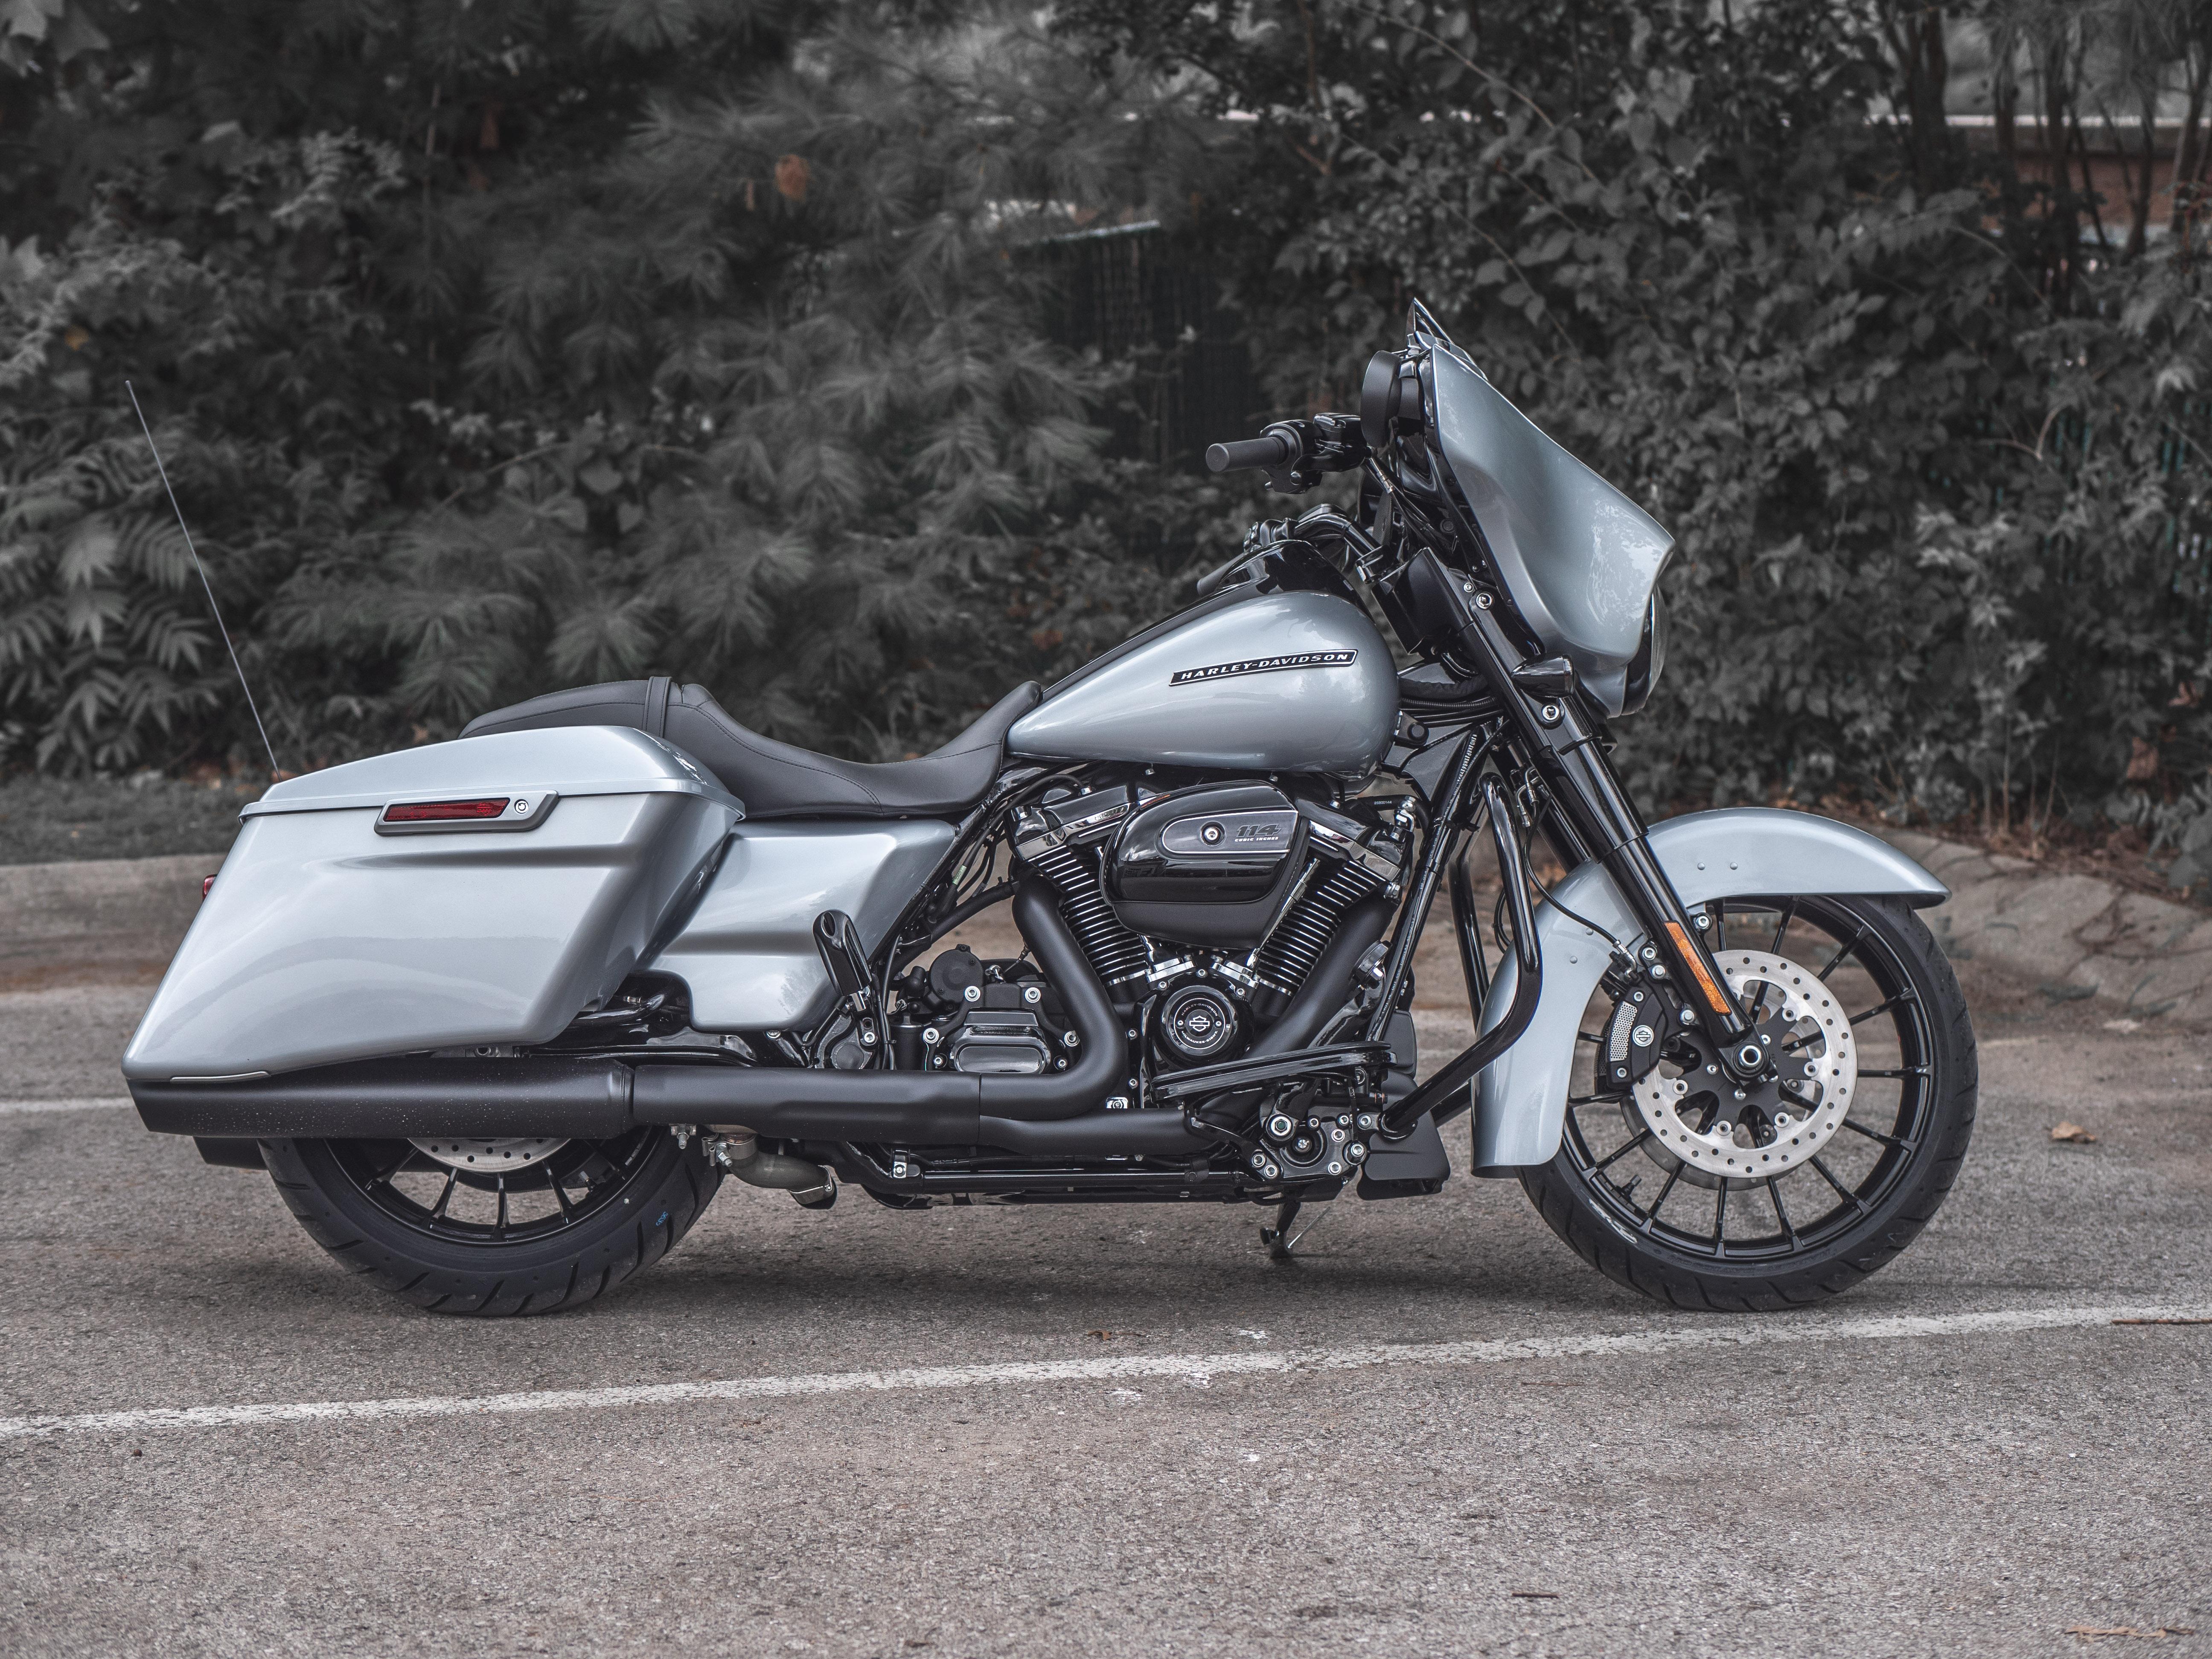 New 2019 Harley-Davidson Street Glide Special FLHXS